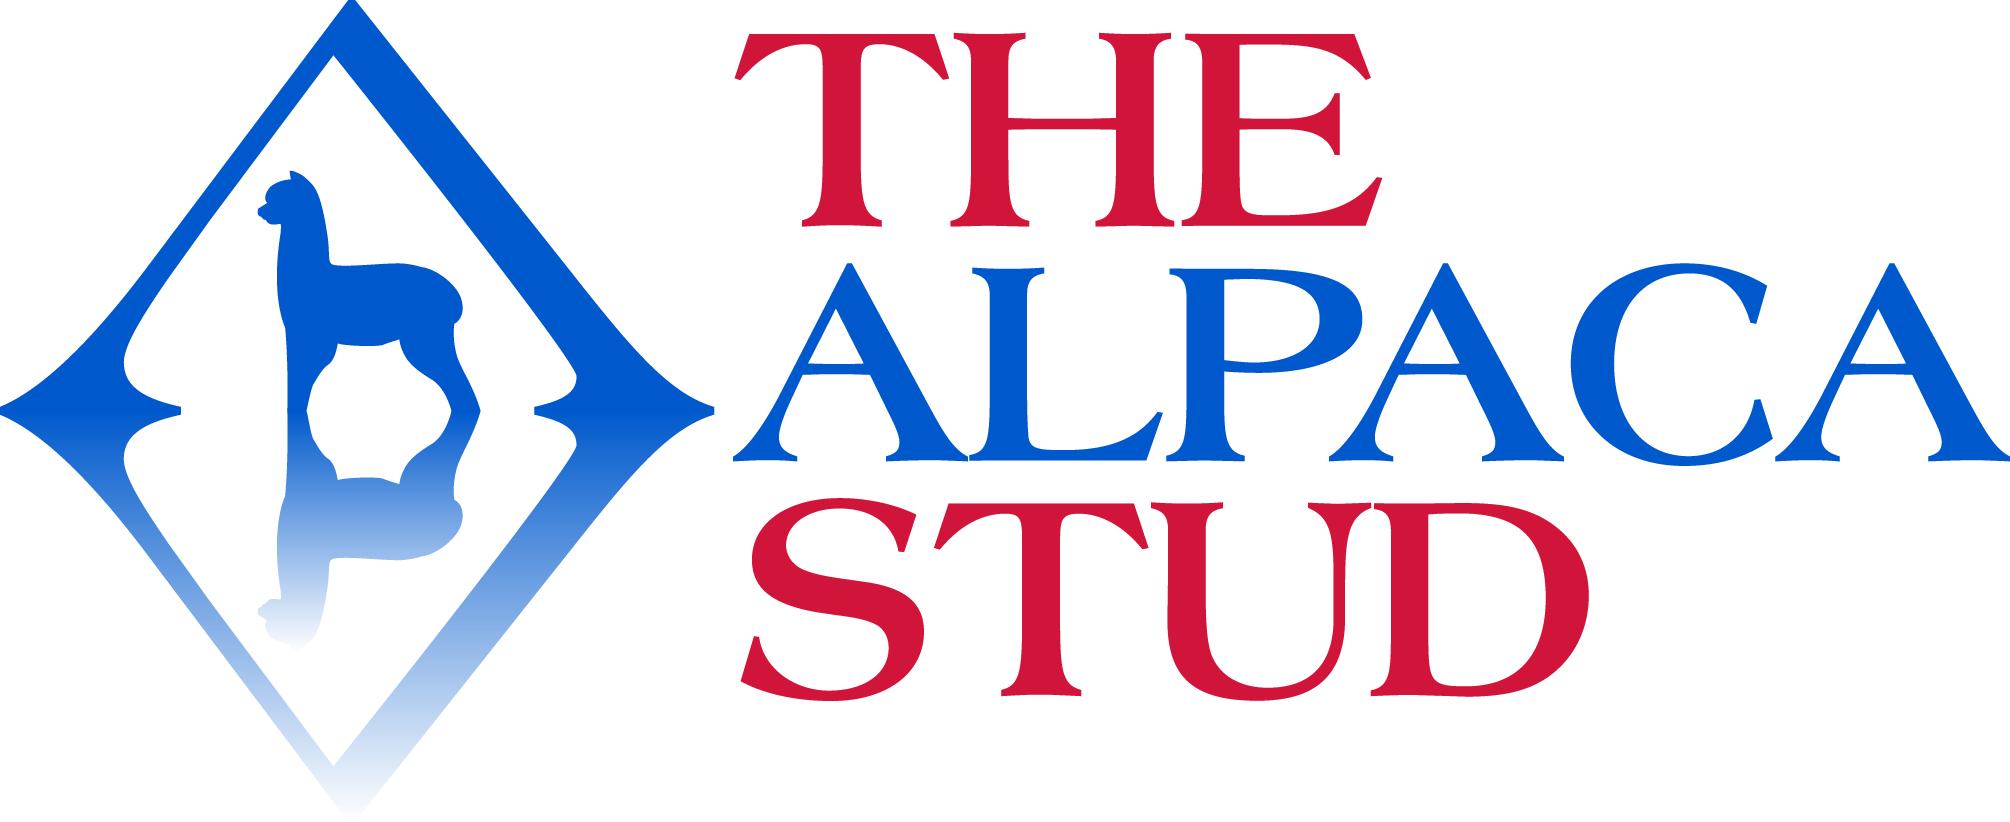 Alpaca Stud logo